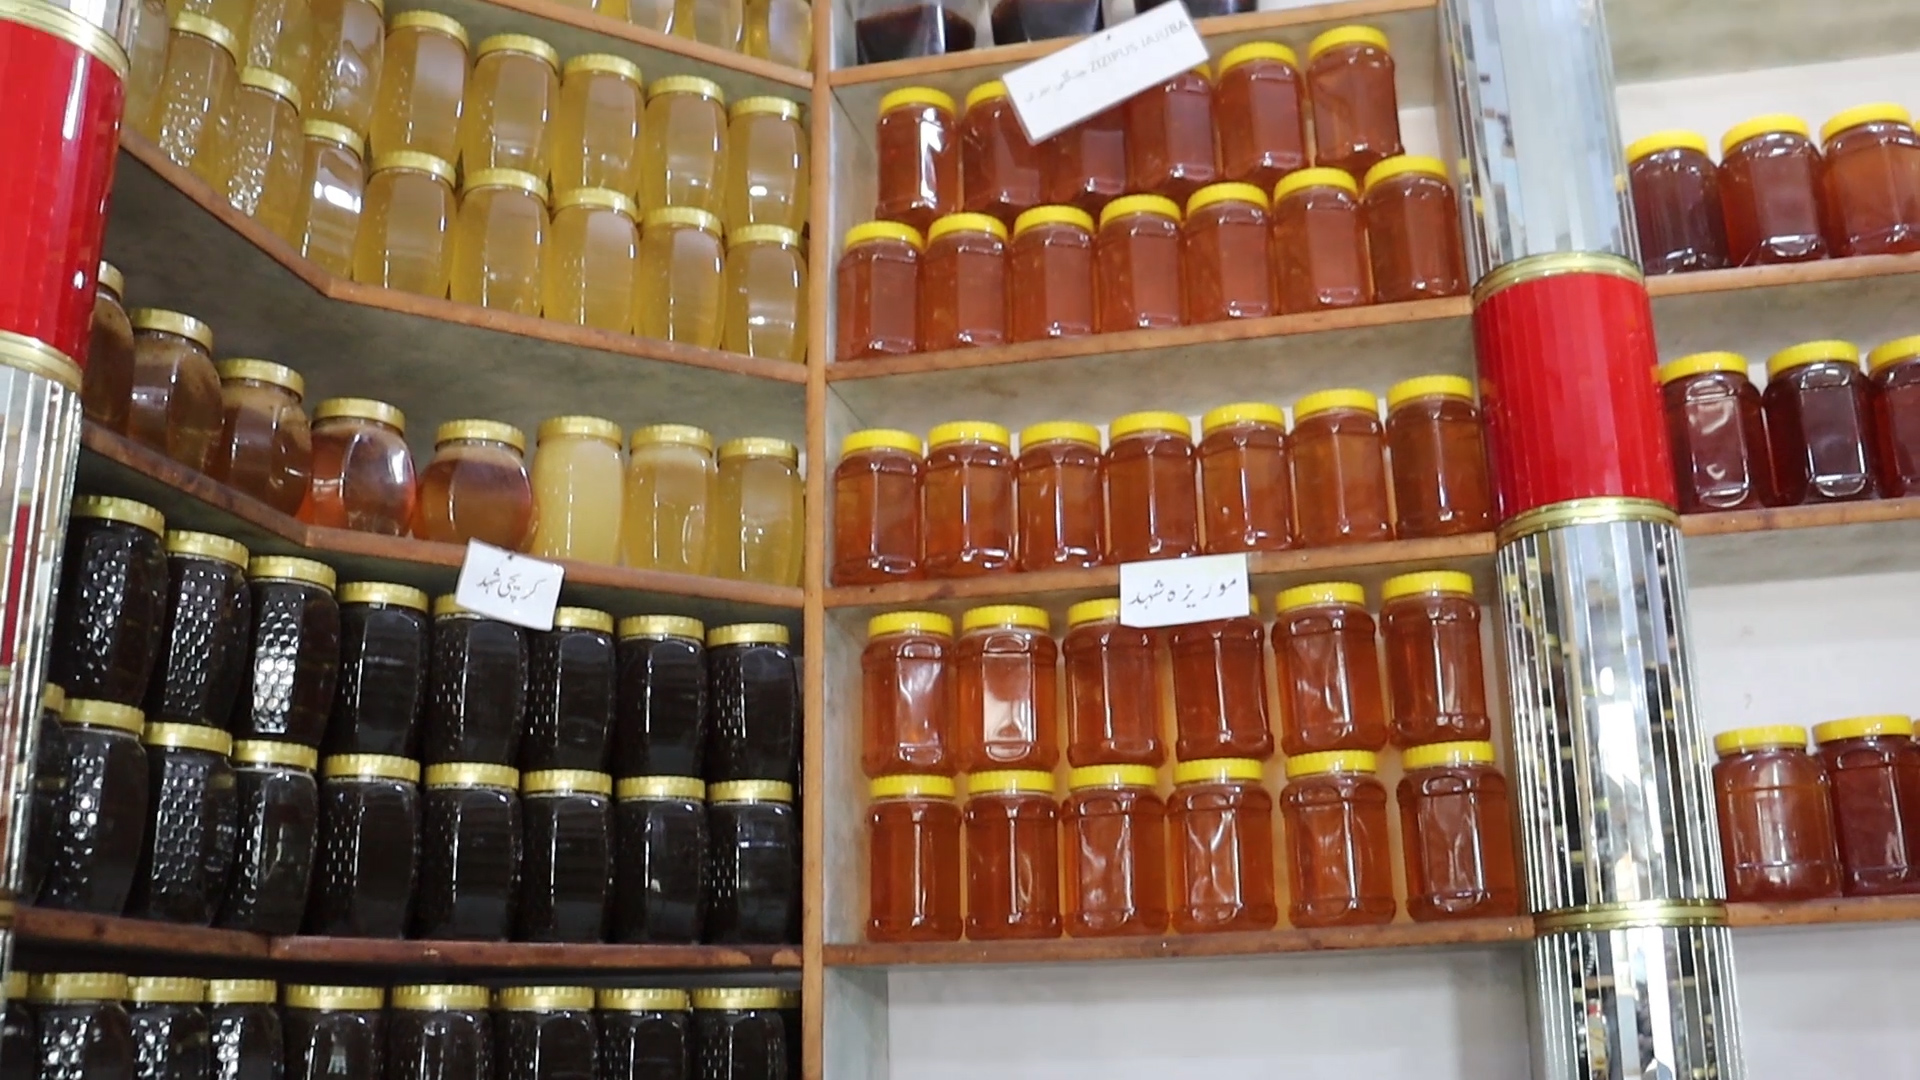 Peshawar Corona Honey.00_00_39_23.Still001.jpg